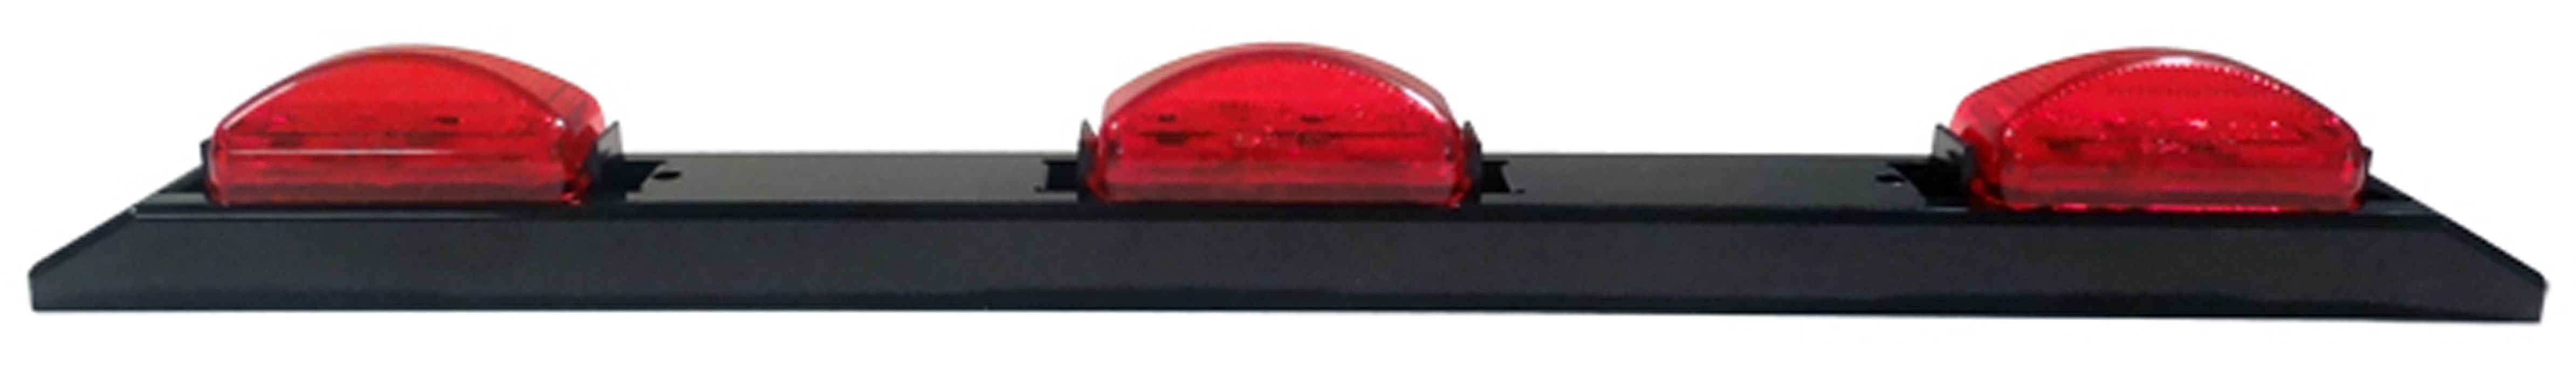 "17"" Long Plastic Submersible LED 3 Bar Light"